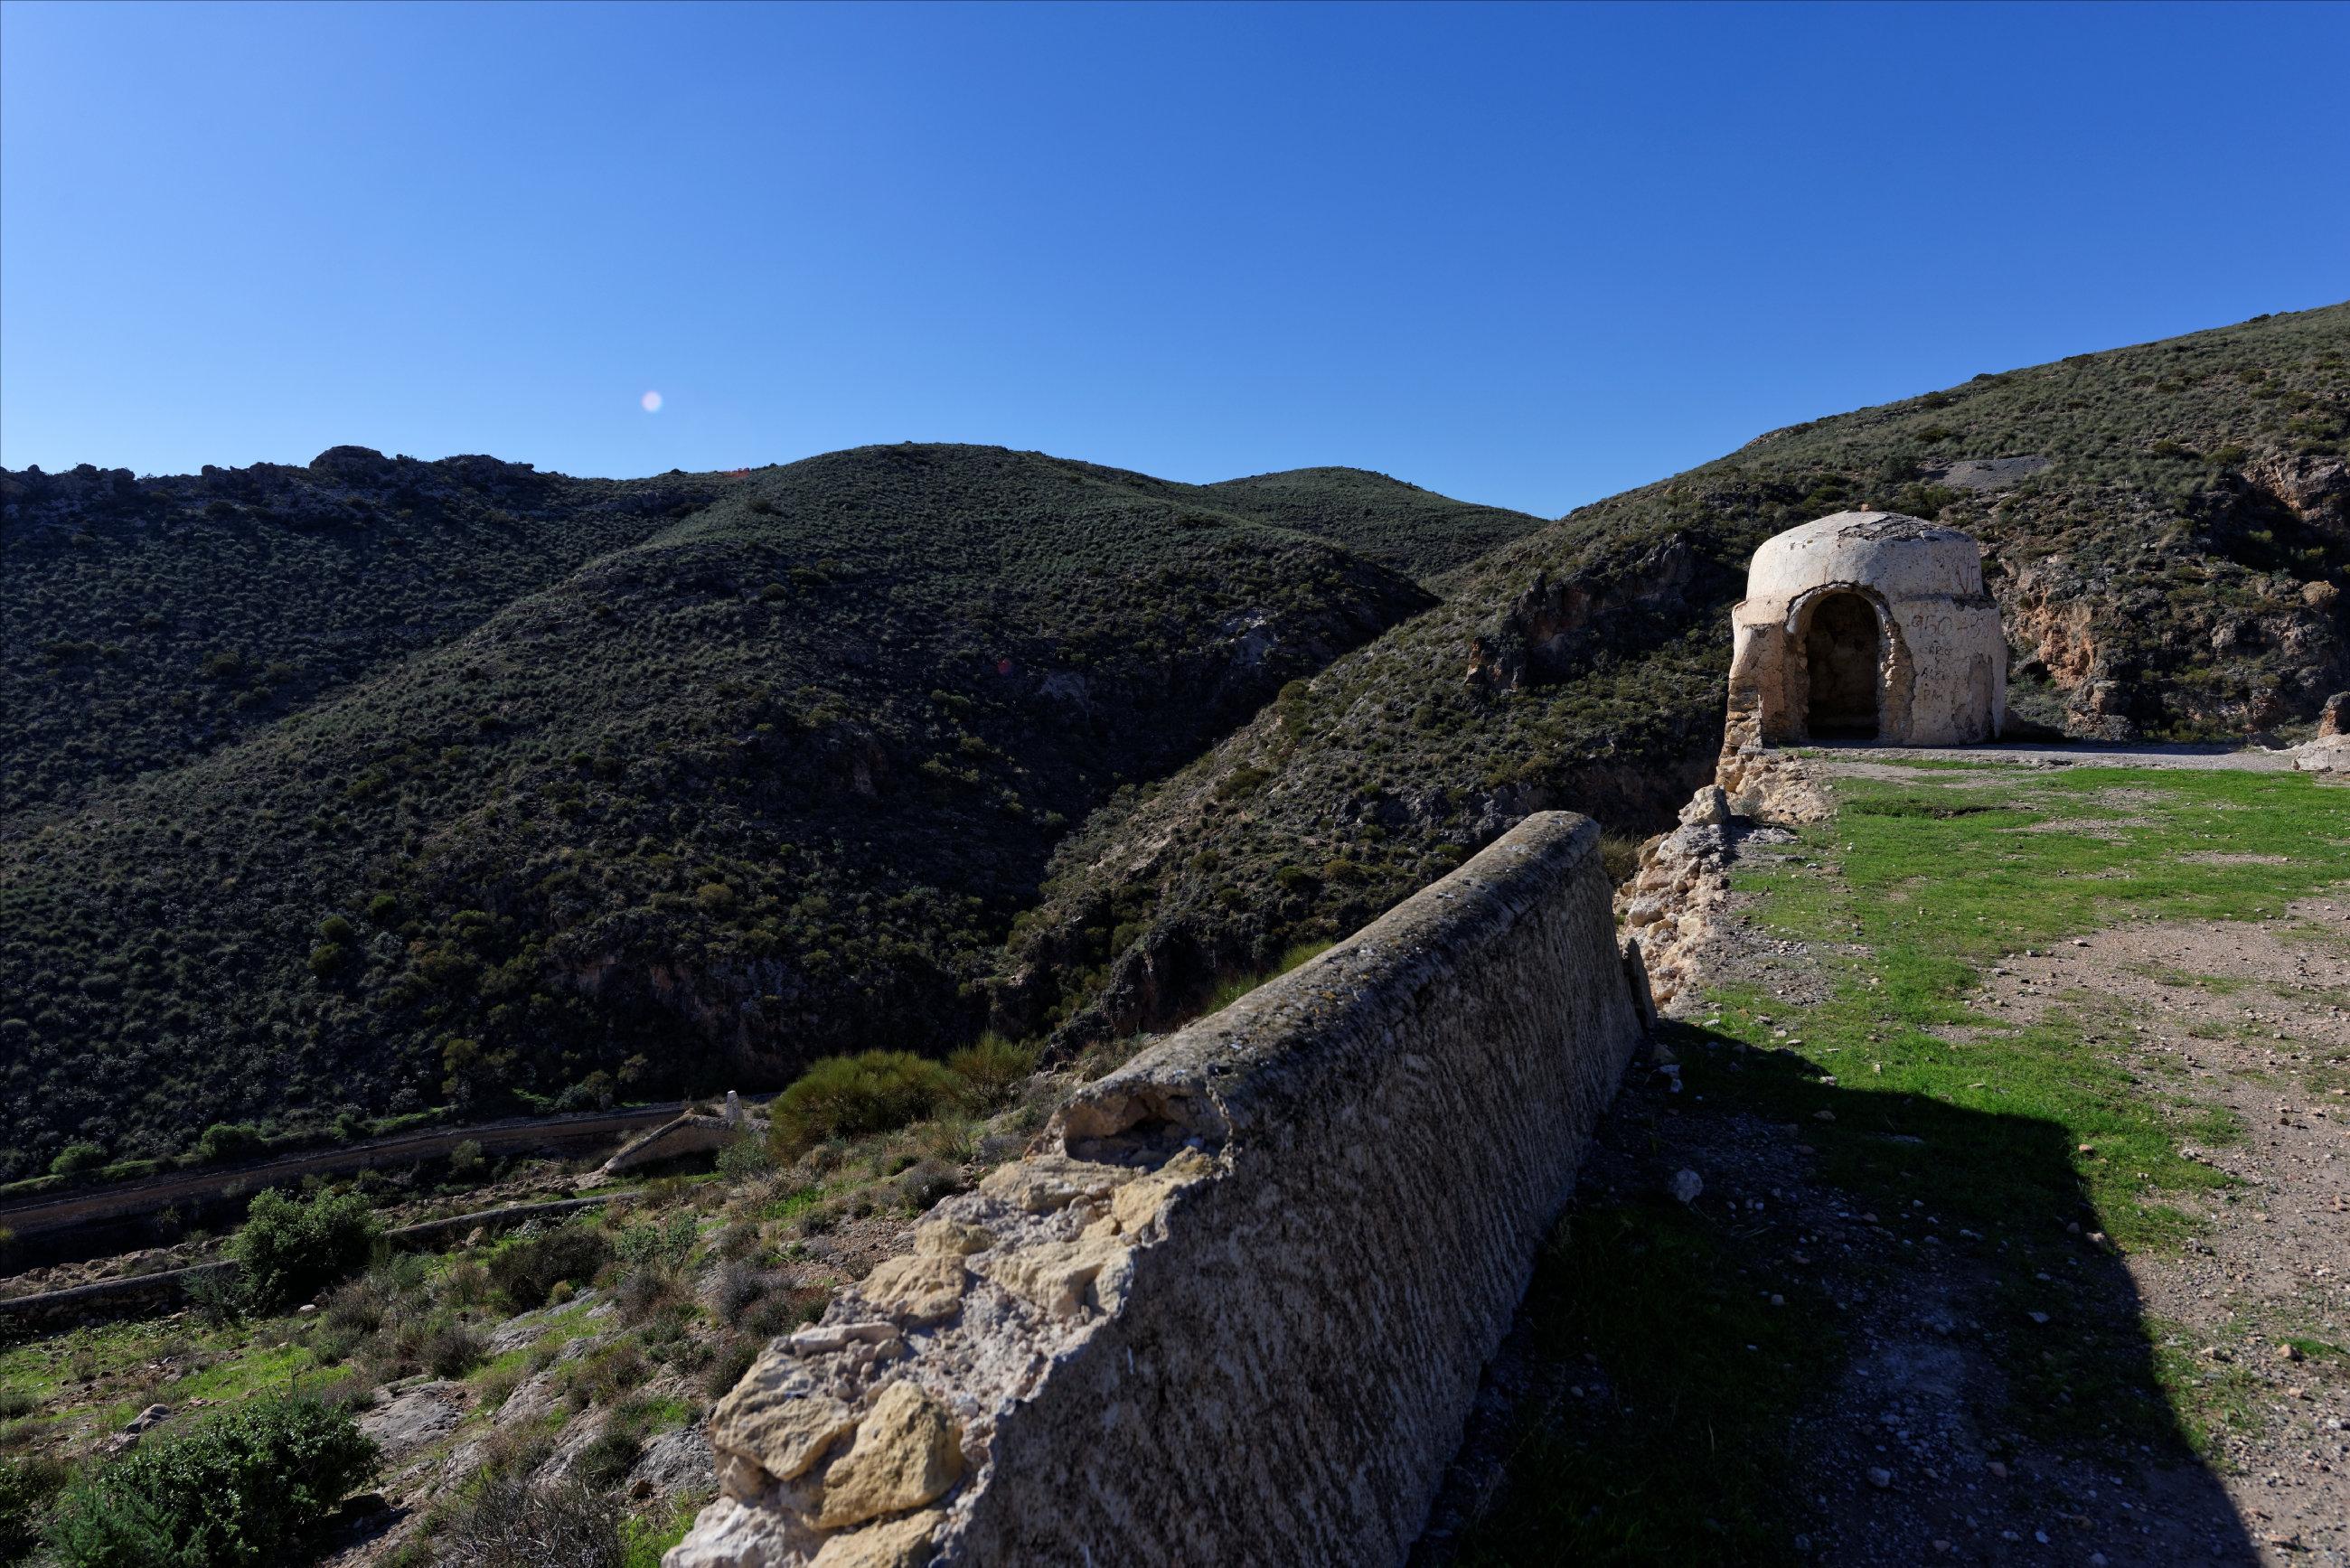 151107-Nijar - Embalse Isabel II - Barrage du 19eme (106)